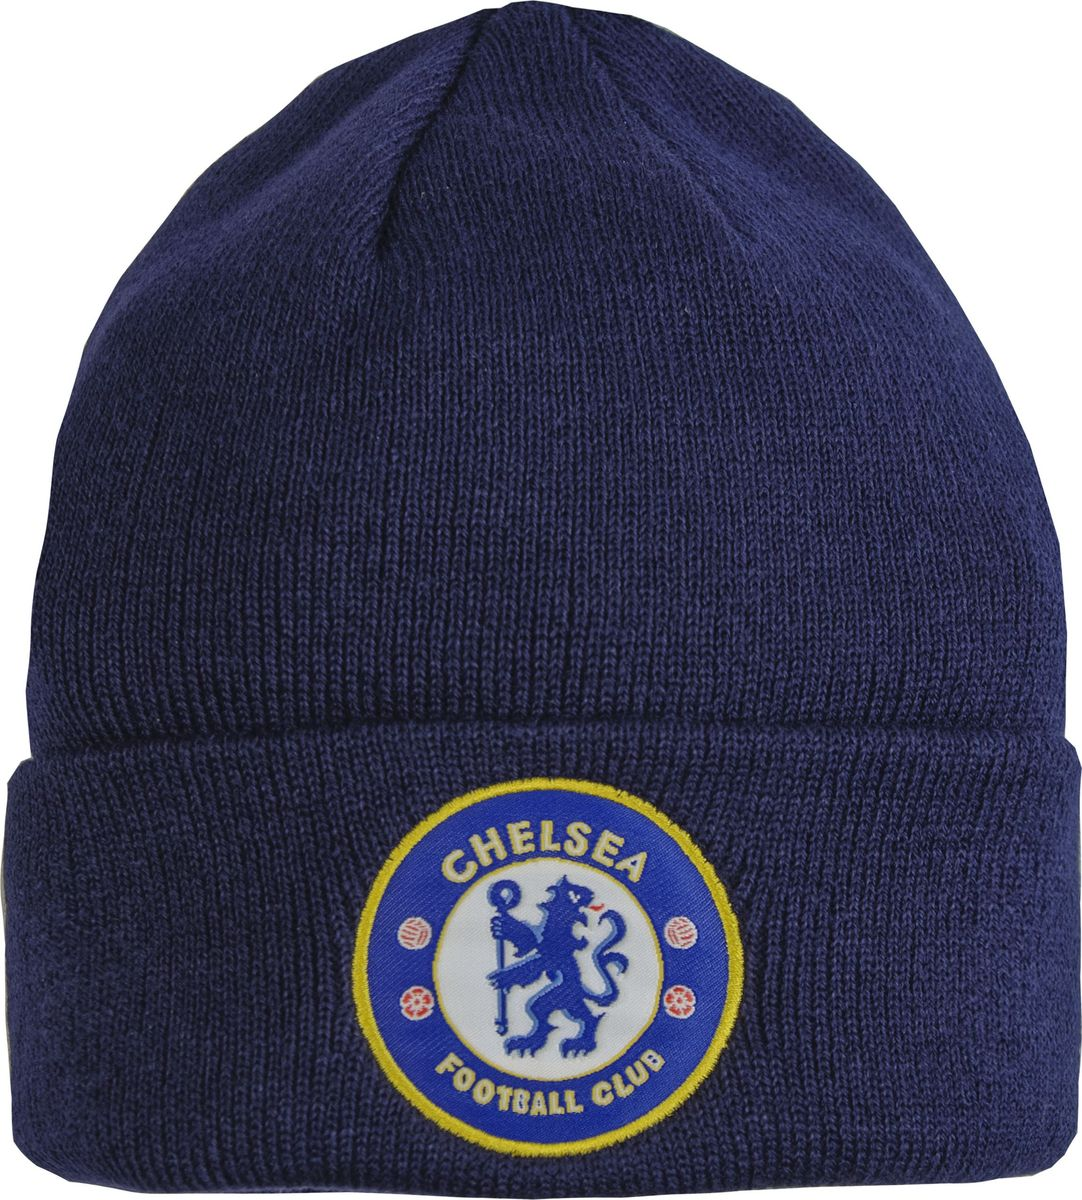 Шапка мужская Atributika & Club Chelsea, цвет: темно-синий. 08010. Размер 55/58